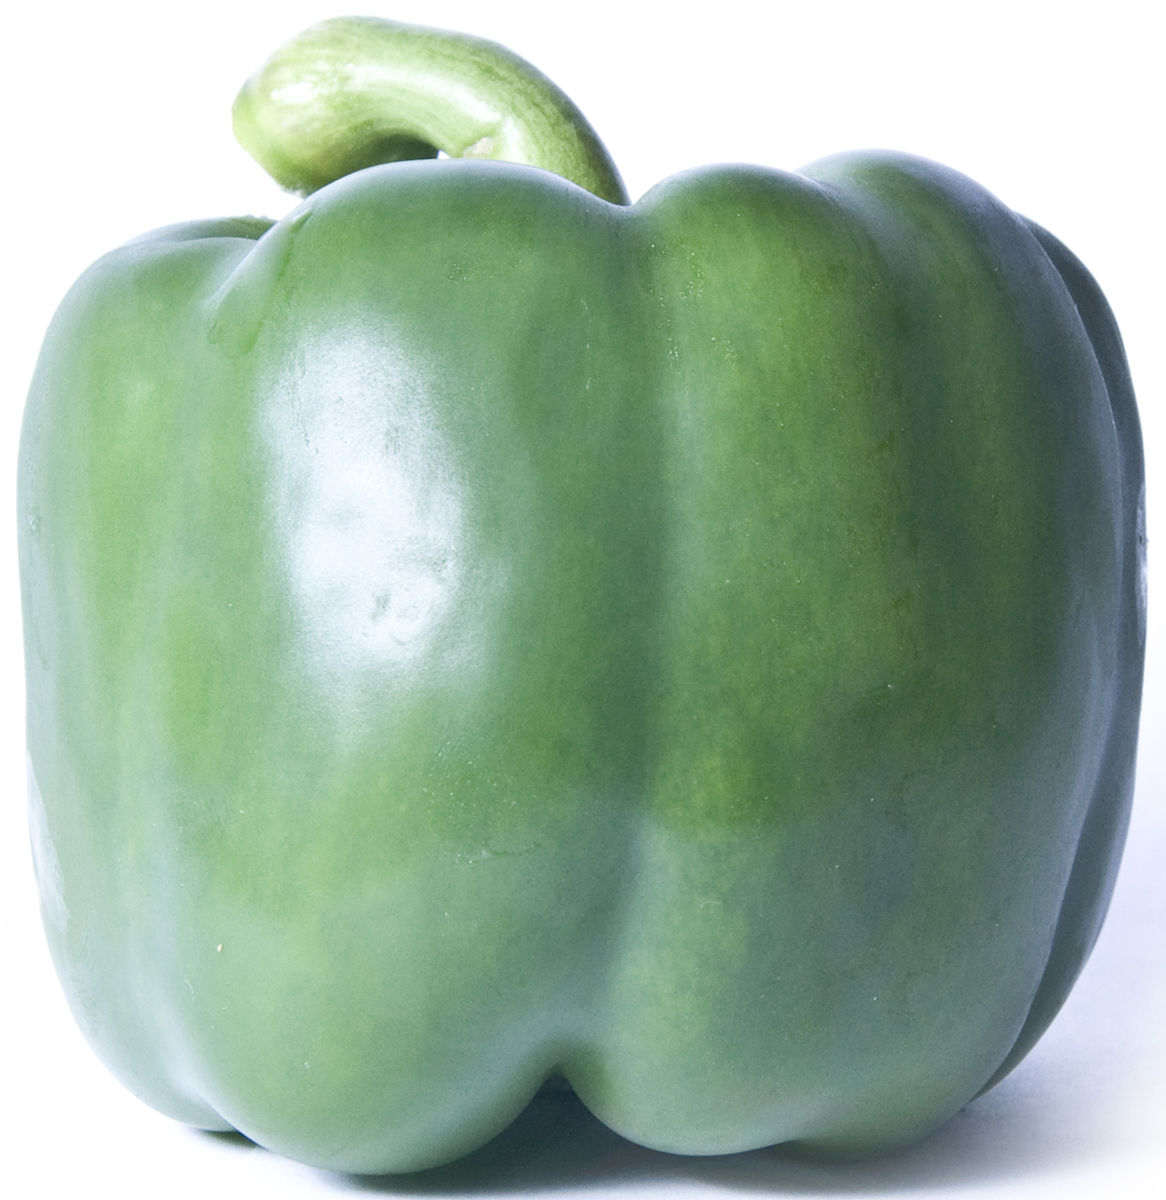 Перец зеленый, 450 г националь булгур 450 г